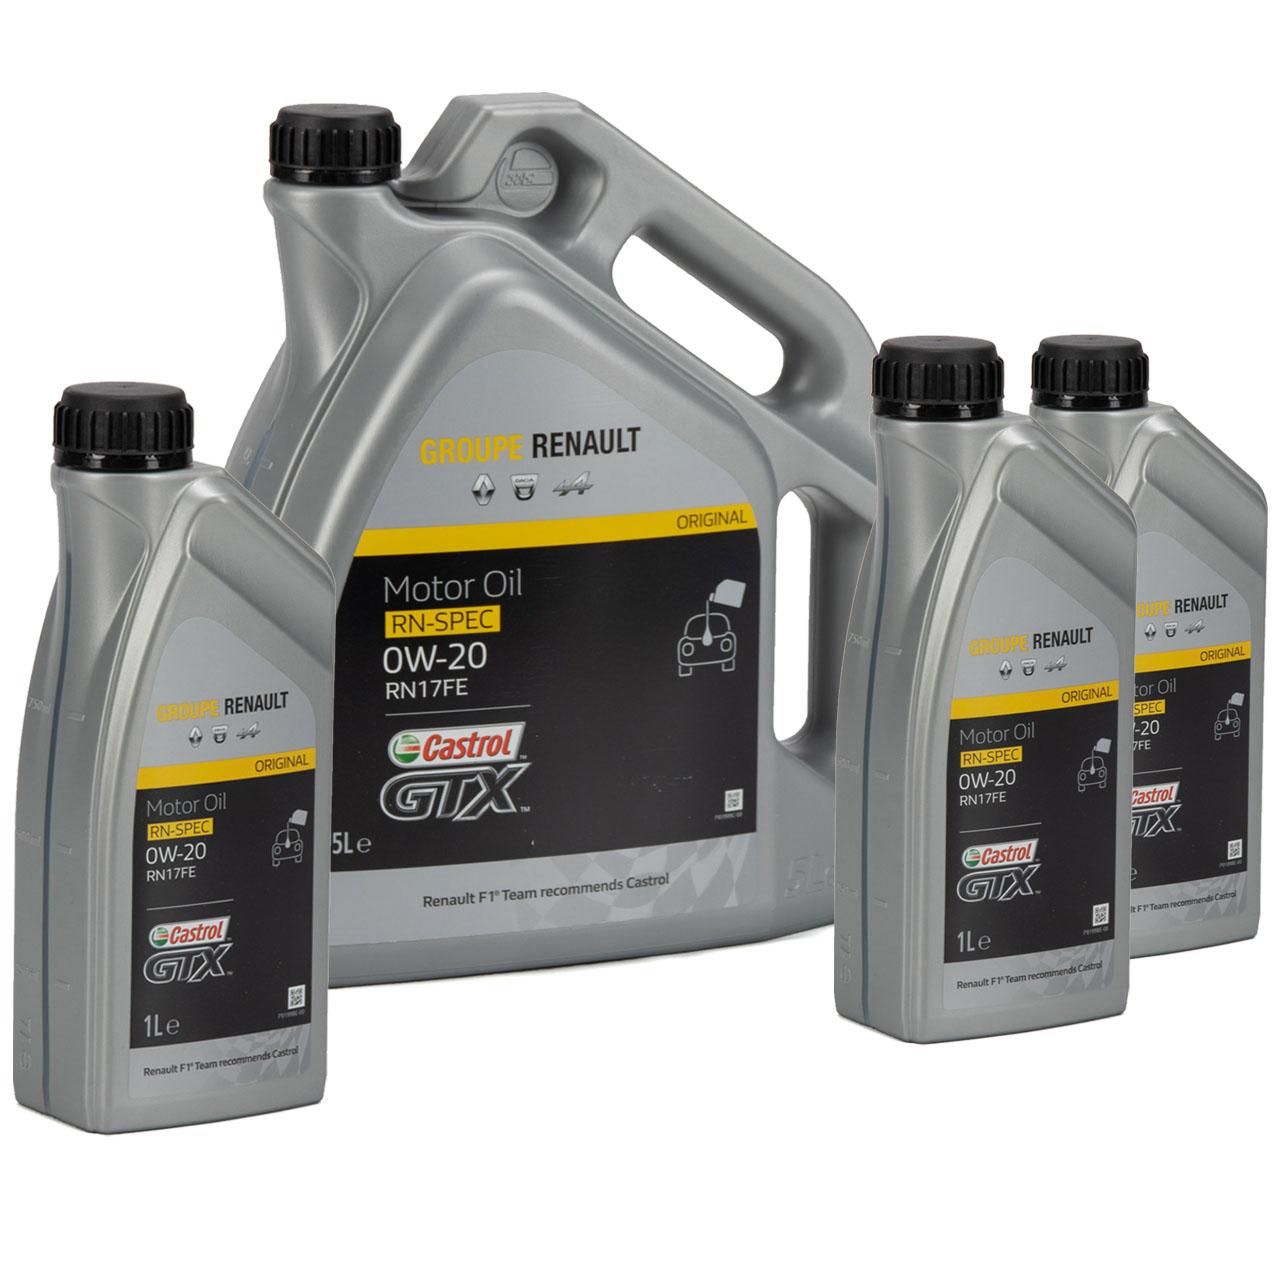 CASTROL Motoröl Öl GTX RN-SPEC 0W-20 0W20 für Renault RN17FE - 8L 8 Liter